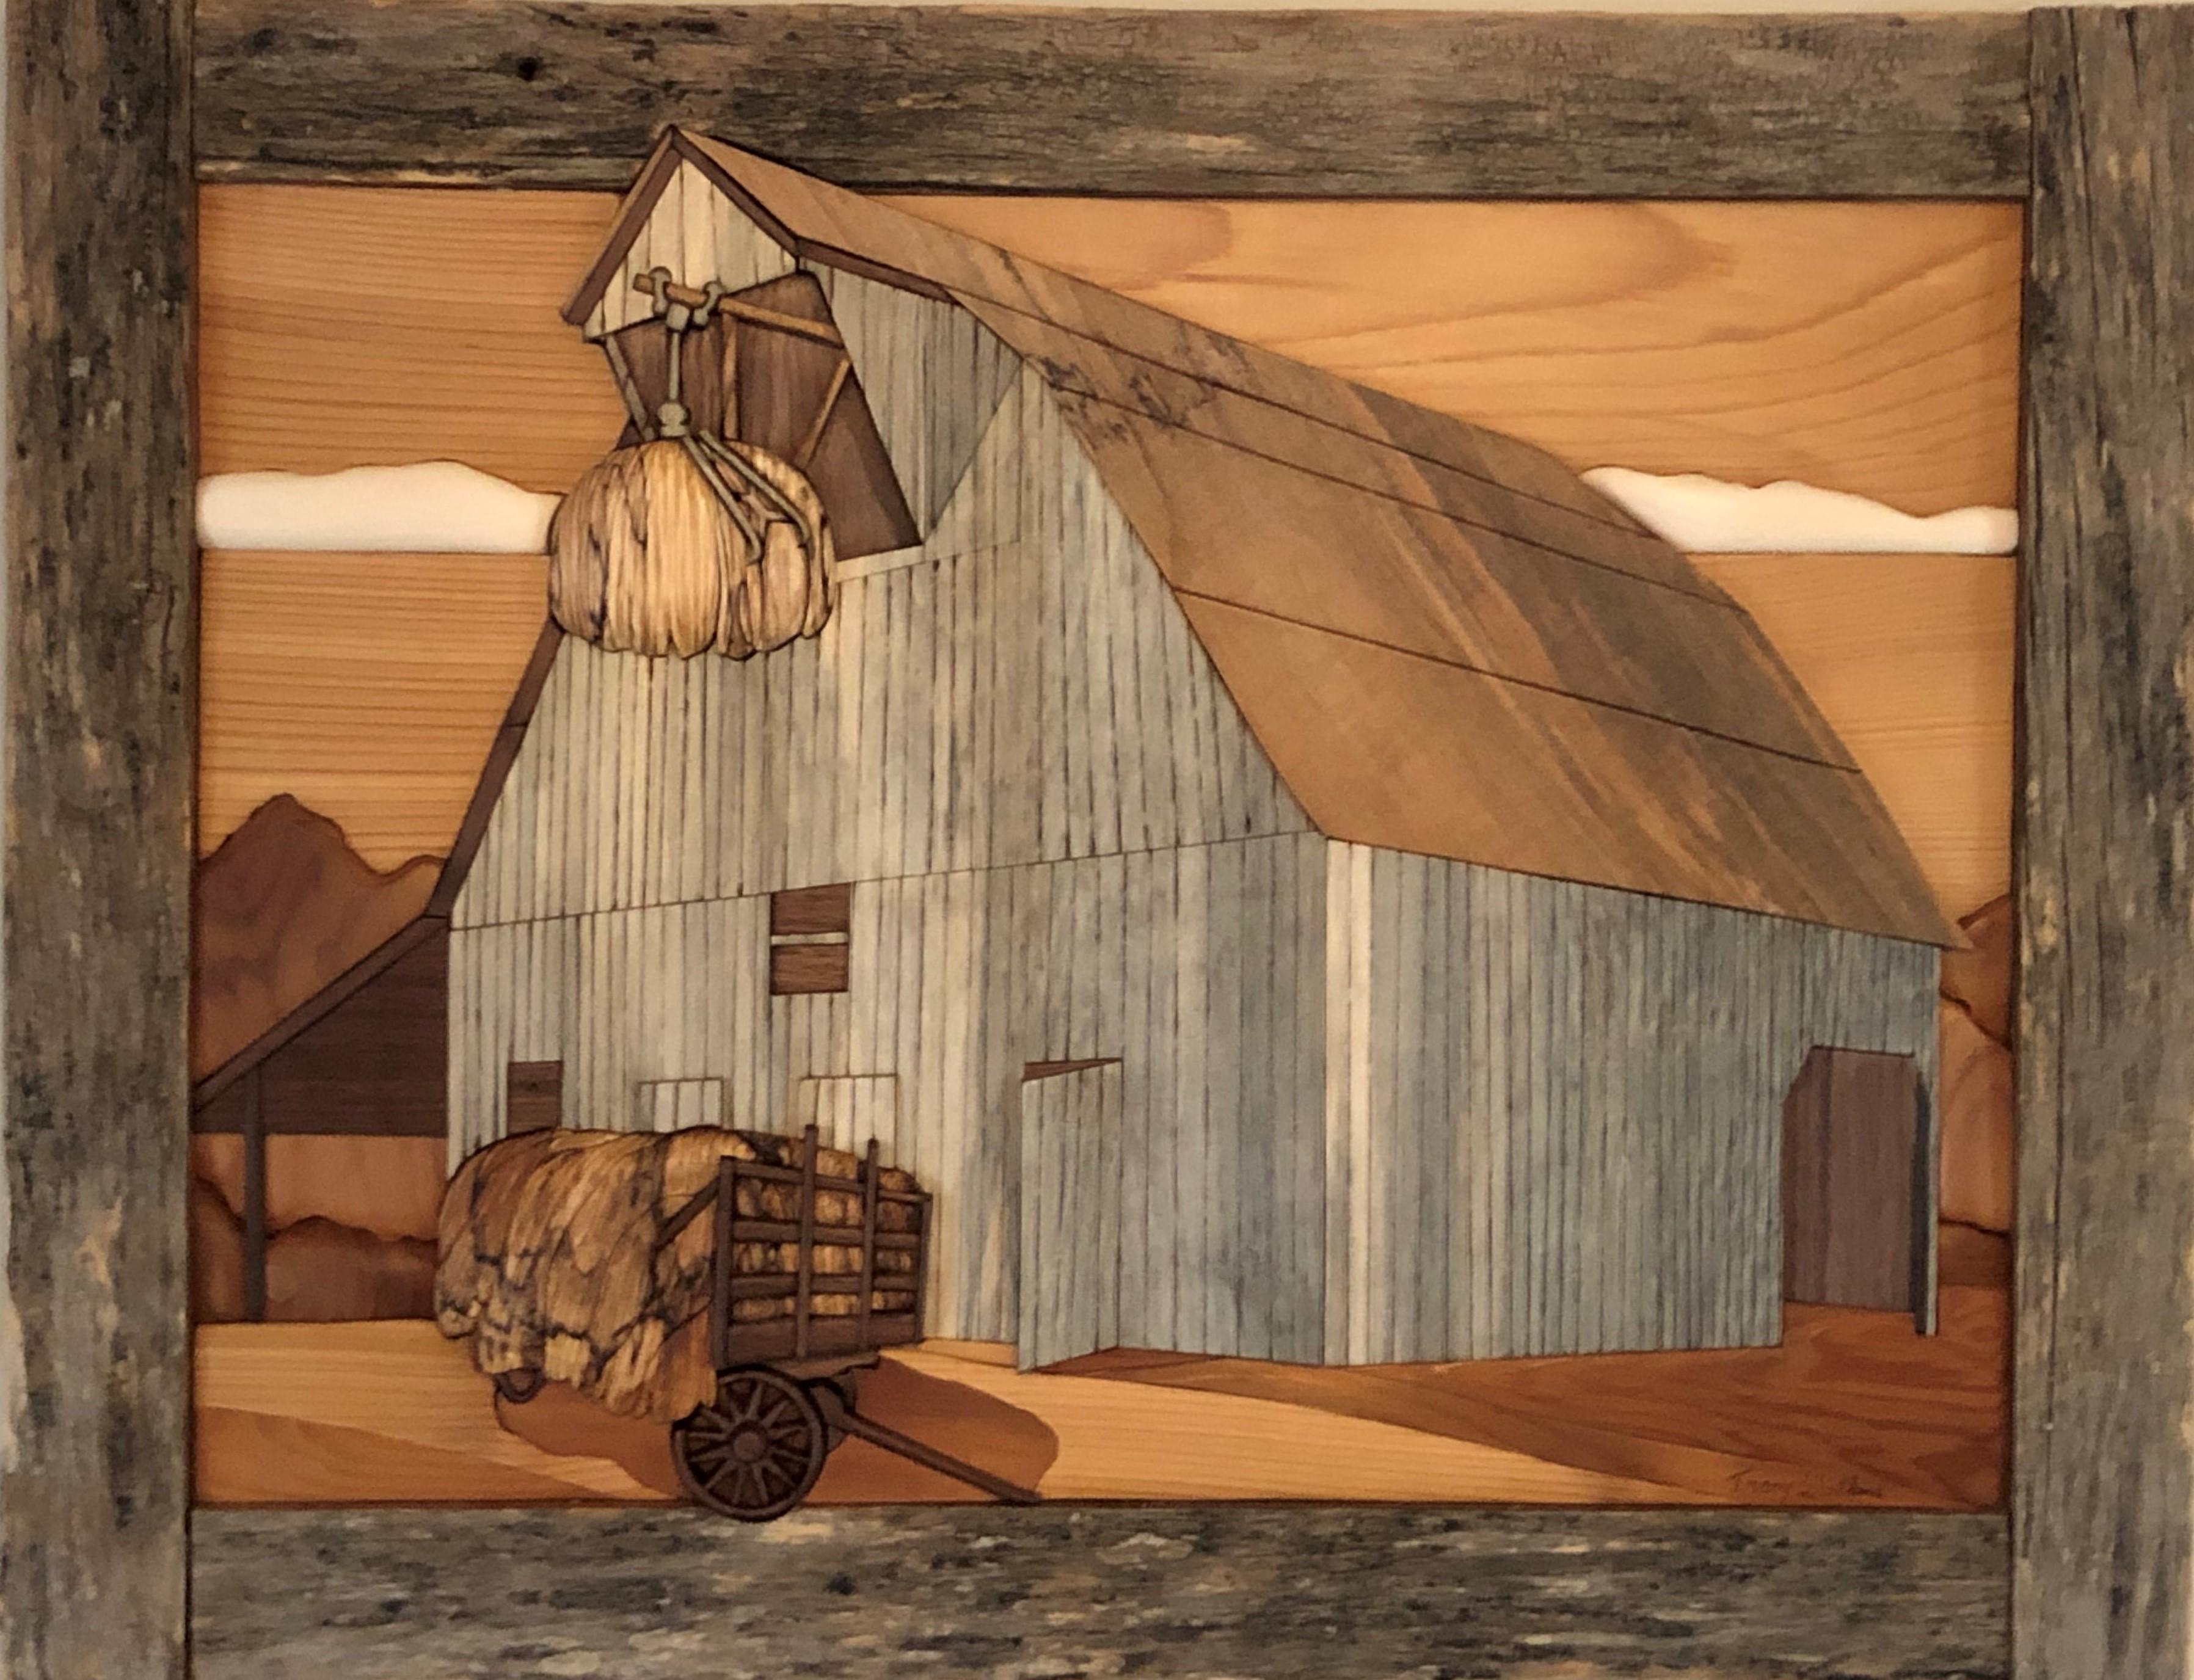 Intarsia Hay Barn